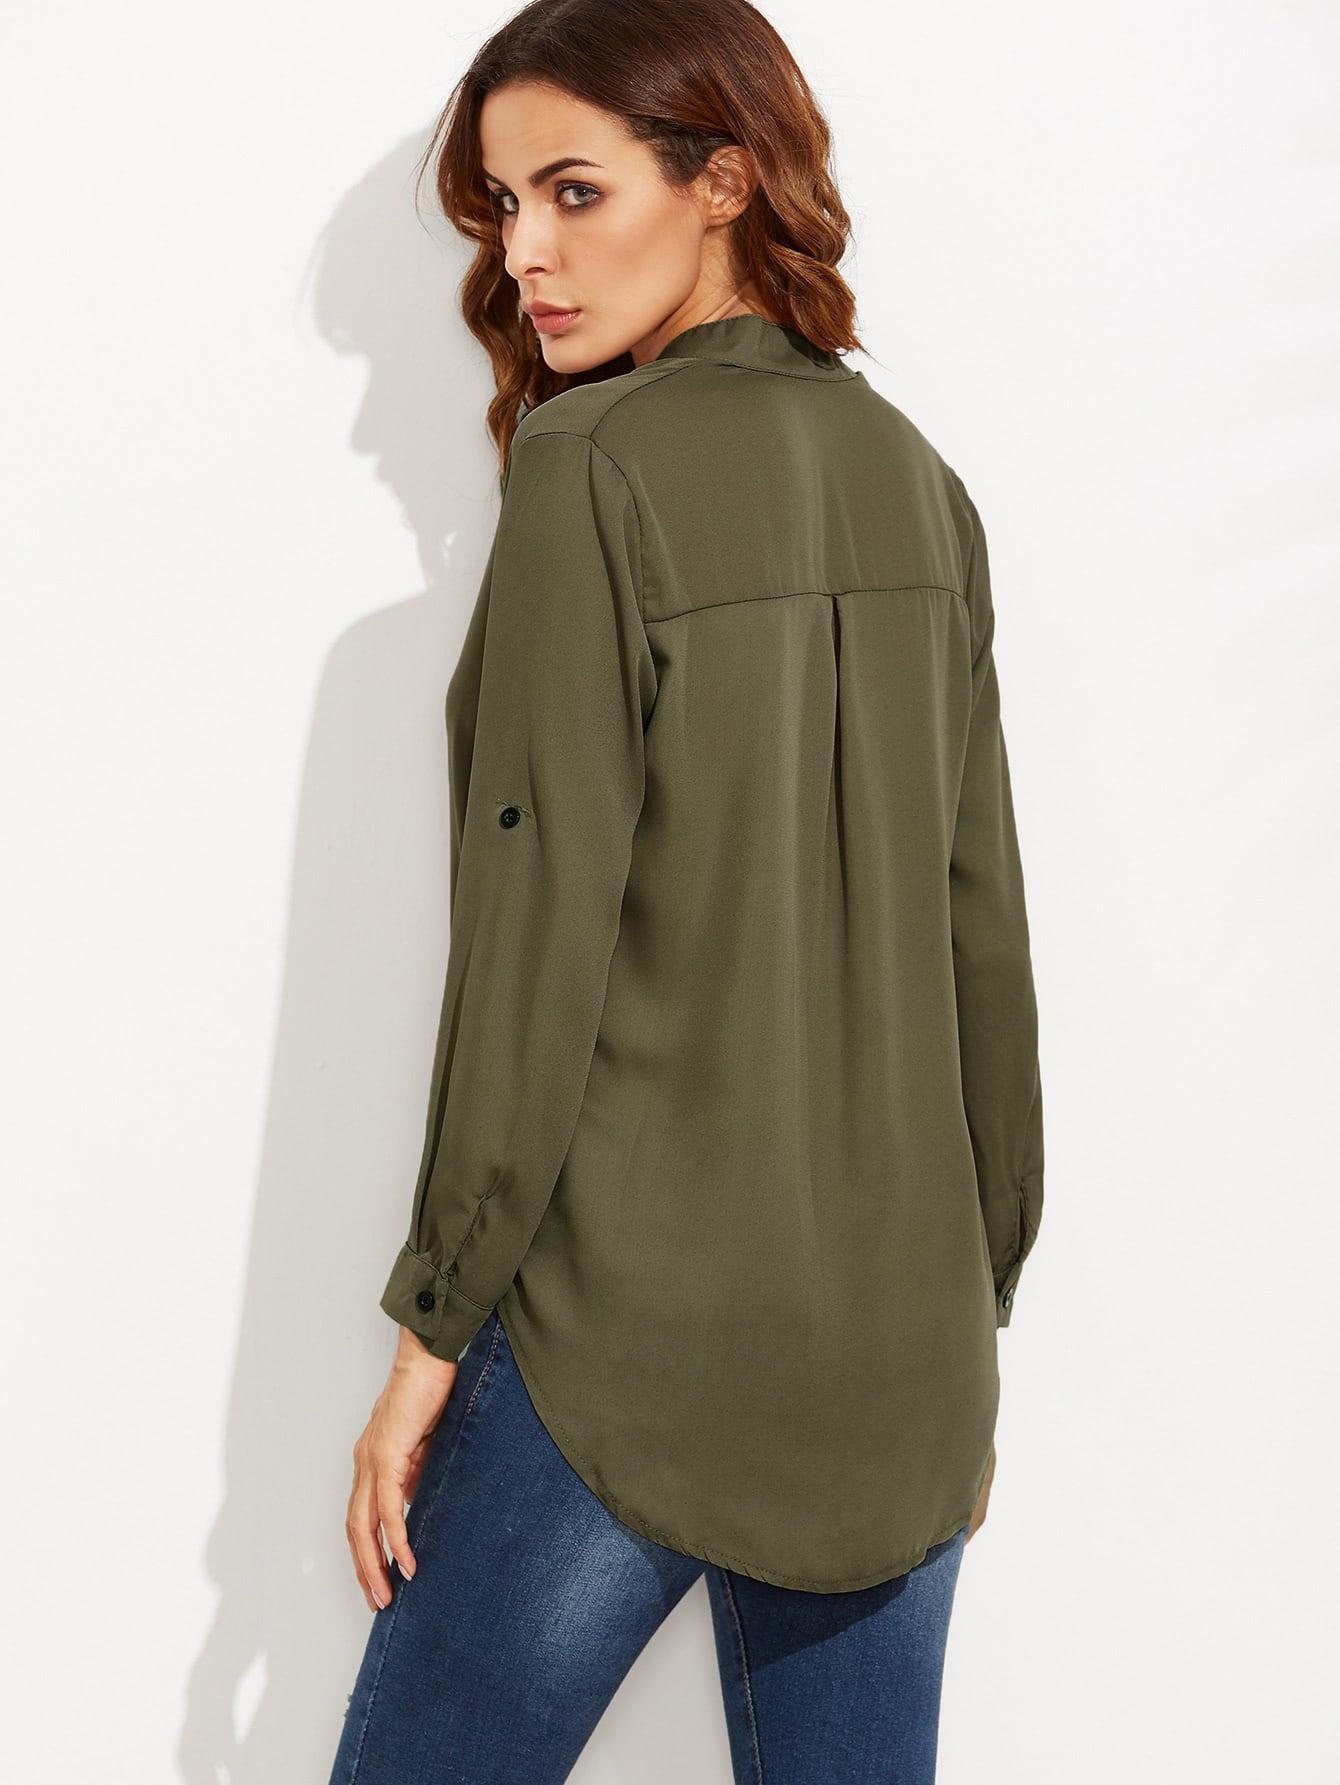 blouse160830122_2